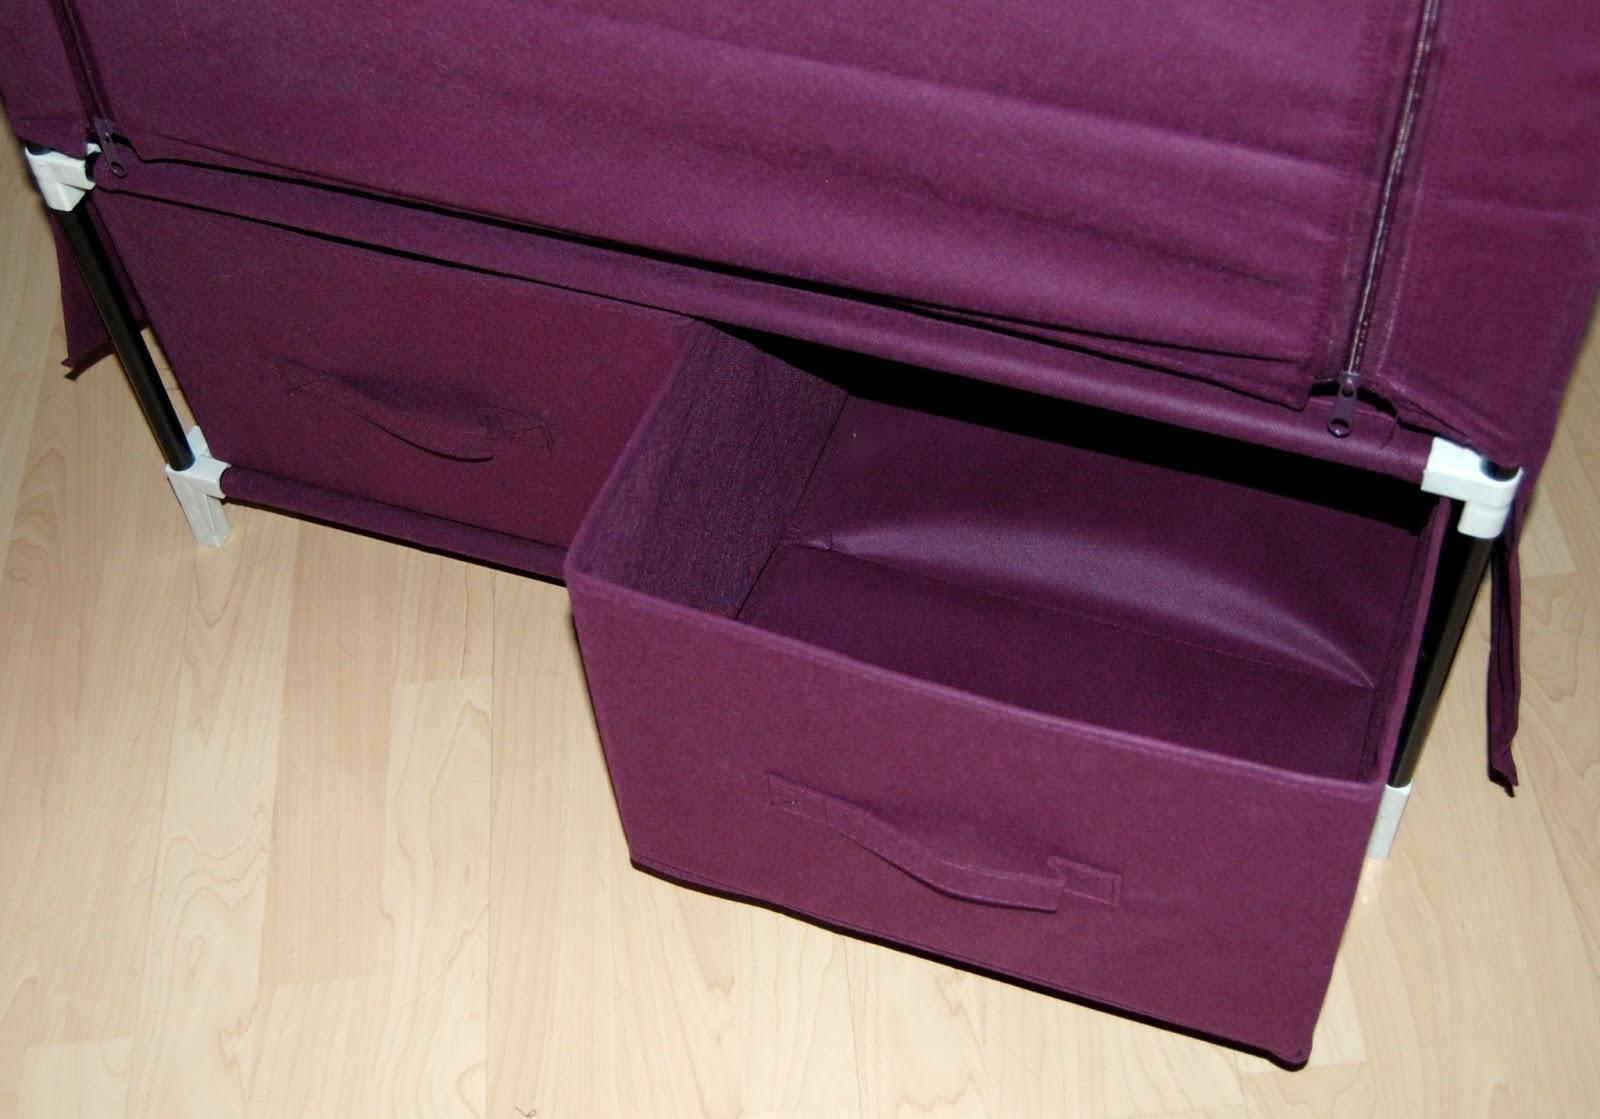 comtessa vanessa relaxdays mein 2 test. Black Bedroom Furniture Sets. Home Design Ideas